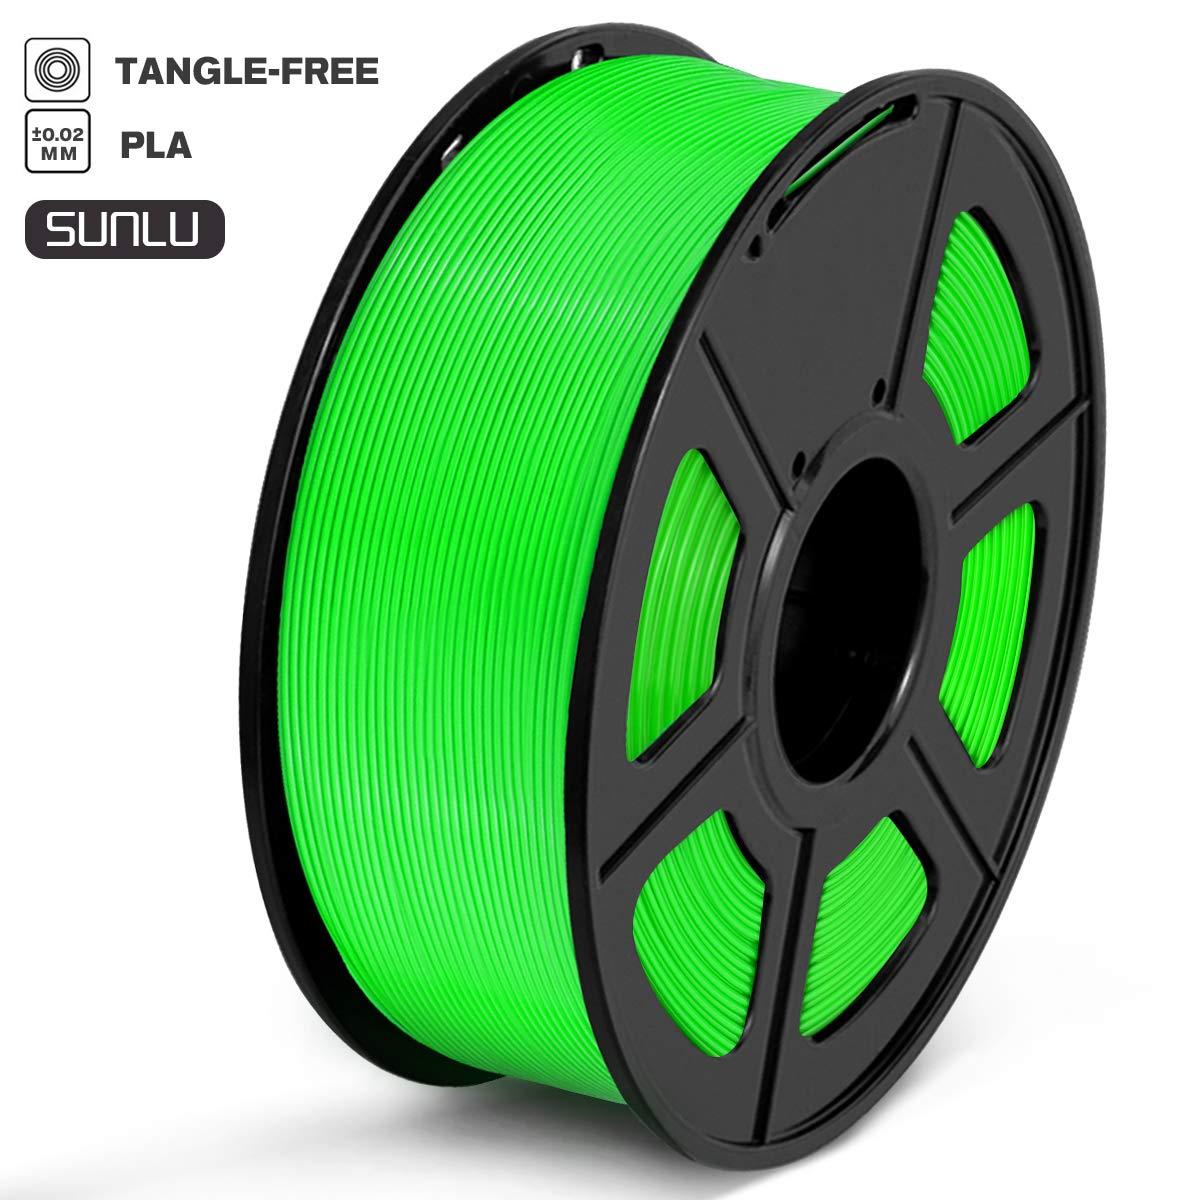 SUNLU PLA Filament 1.75mm 3D Printer Filament PLA Tangle-Free 1kg Spool Dimensional Accuracy of +//- 0.02mm PLA Black 2.2lbs